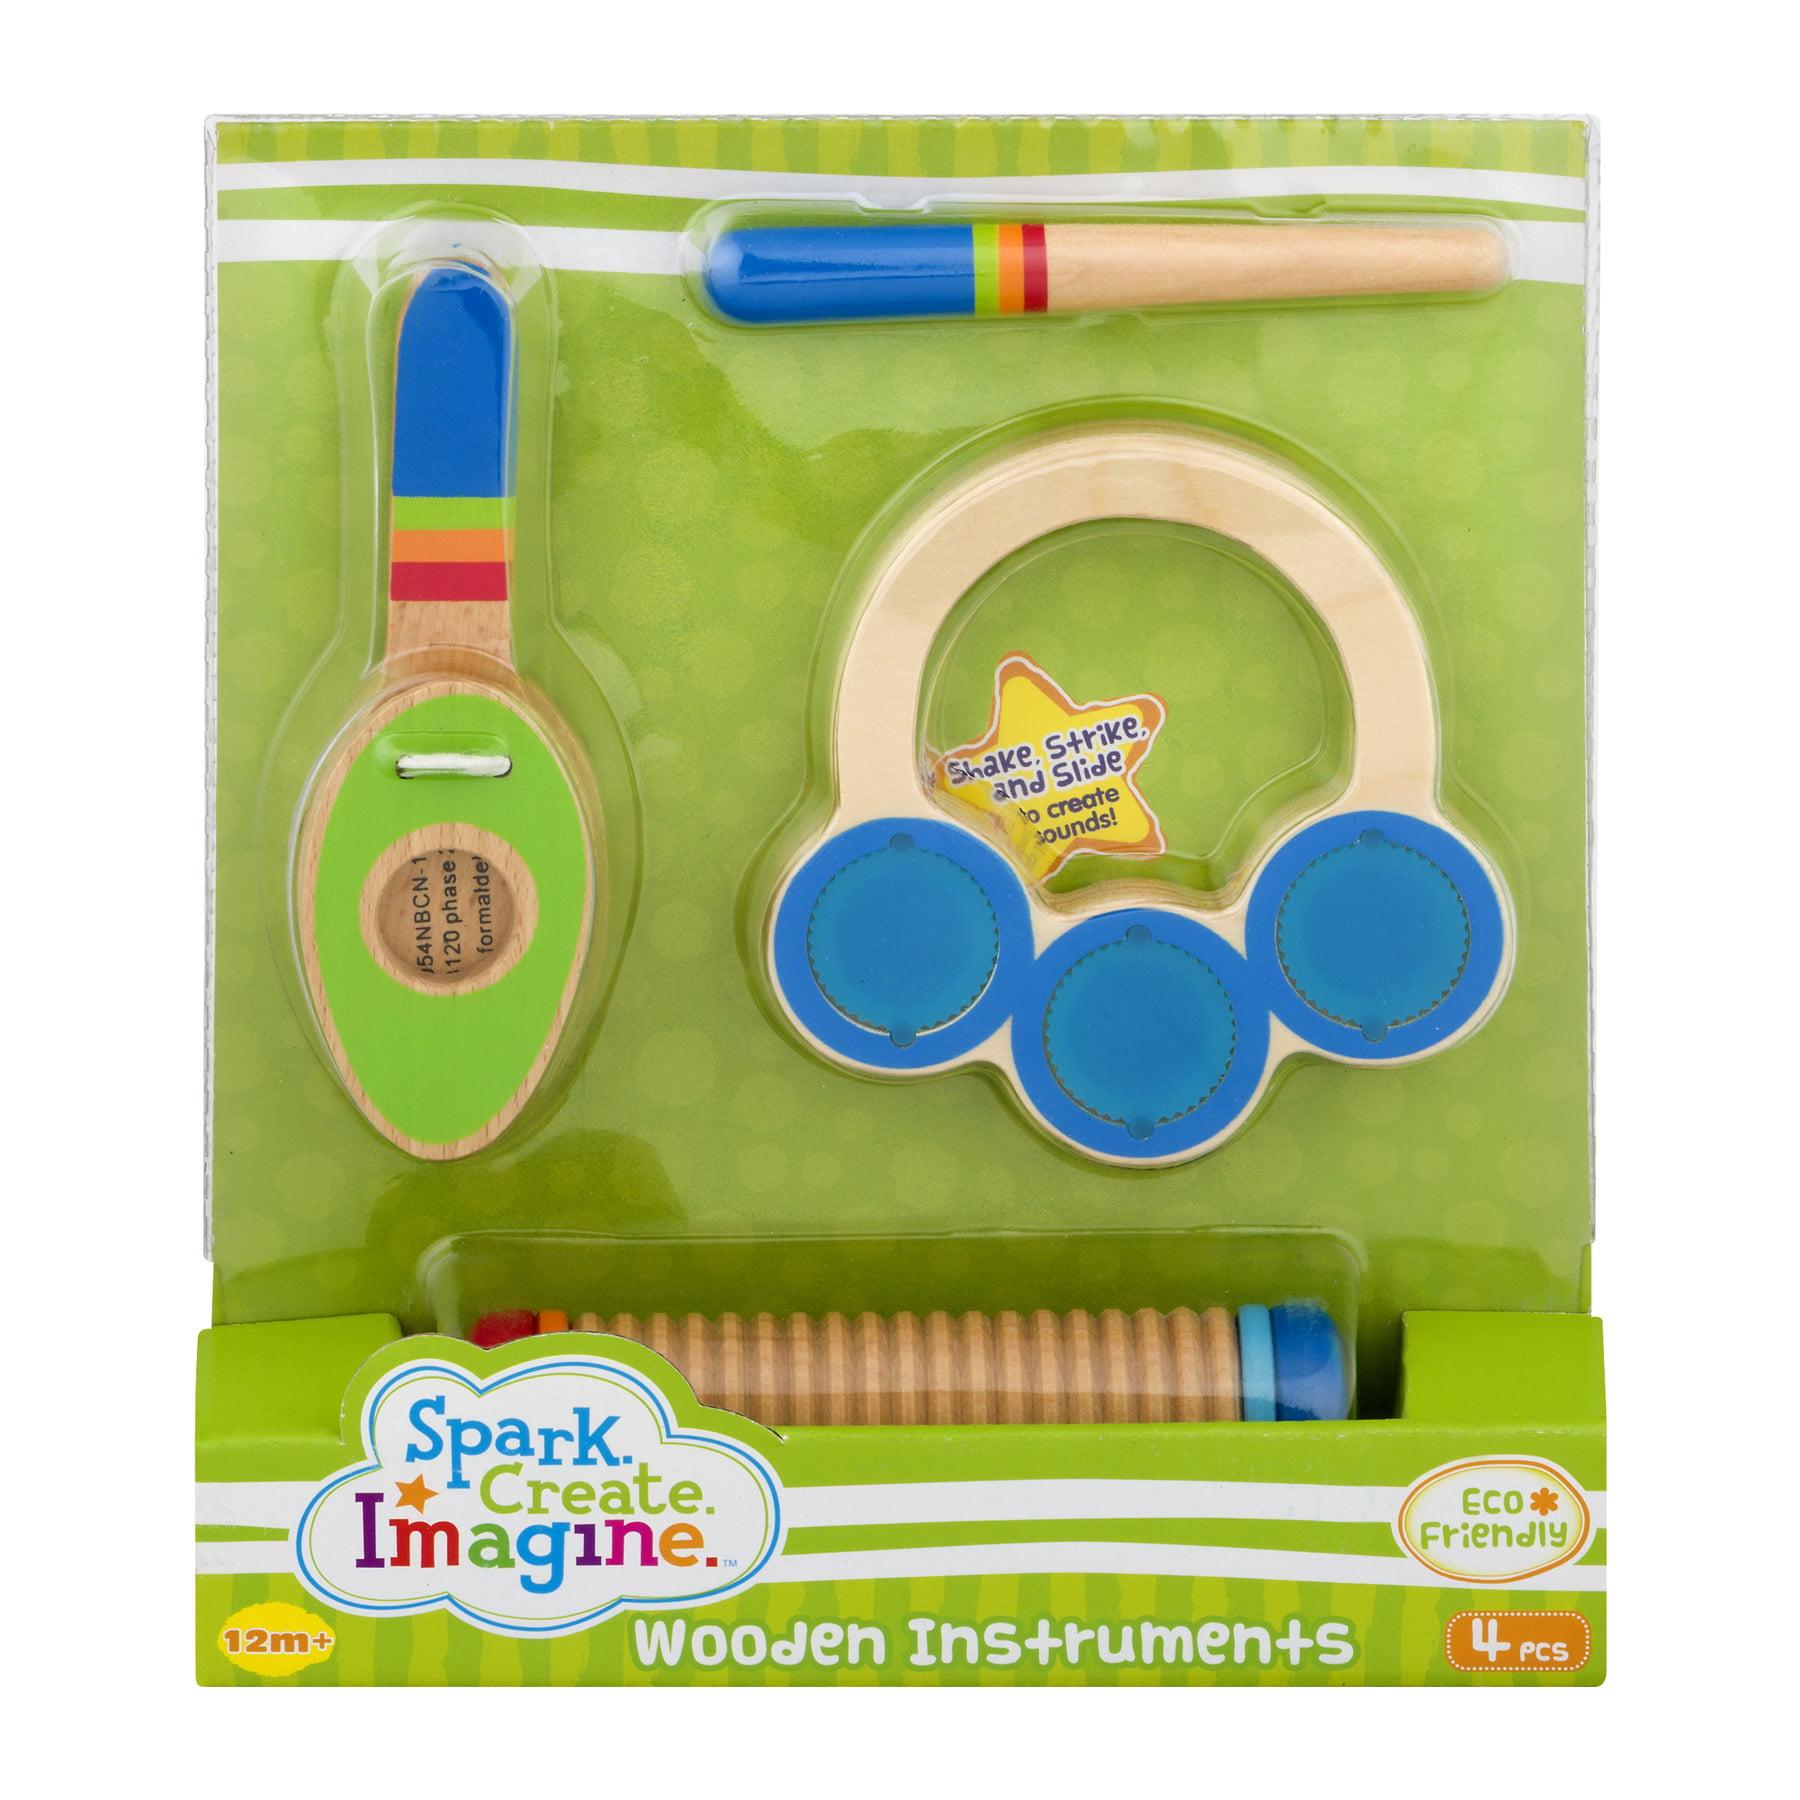 Spark Create Imagine Wooden Instruments, 4.0 PIECE(S)